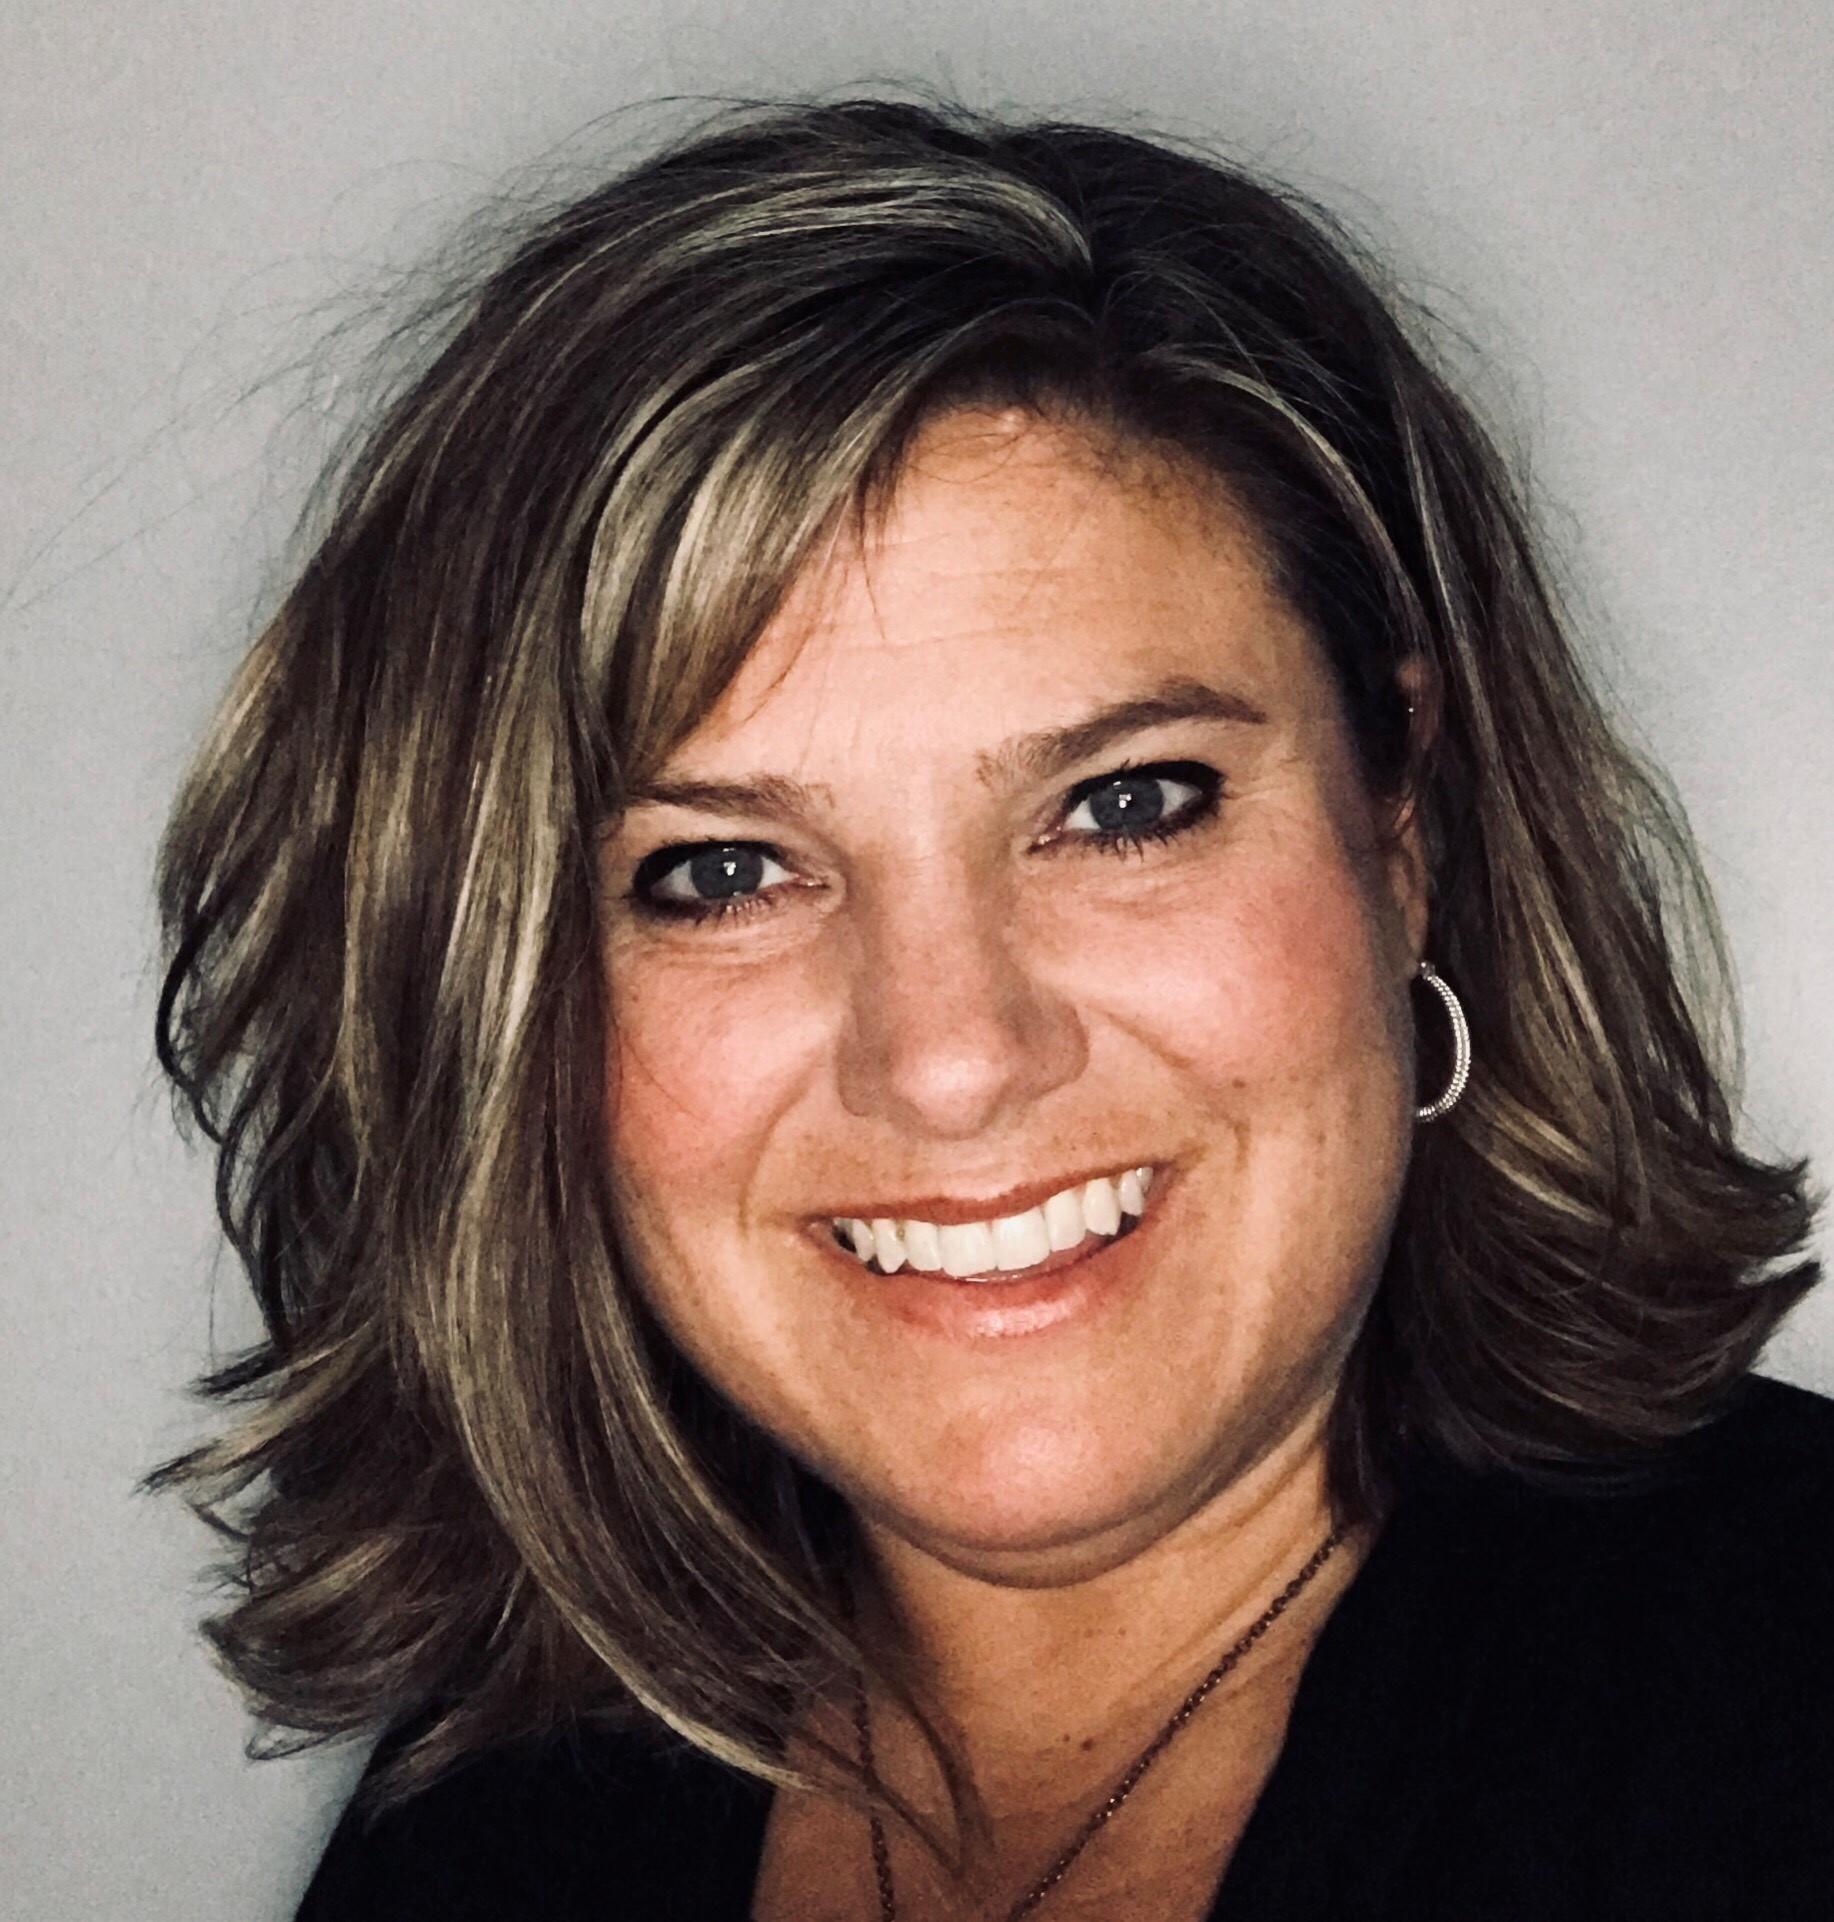 Stacy McGaha